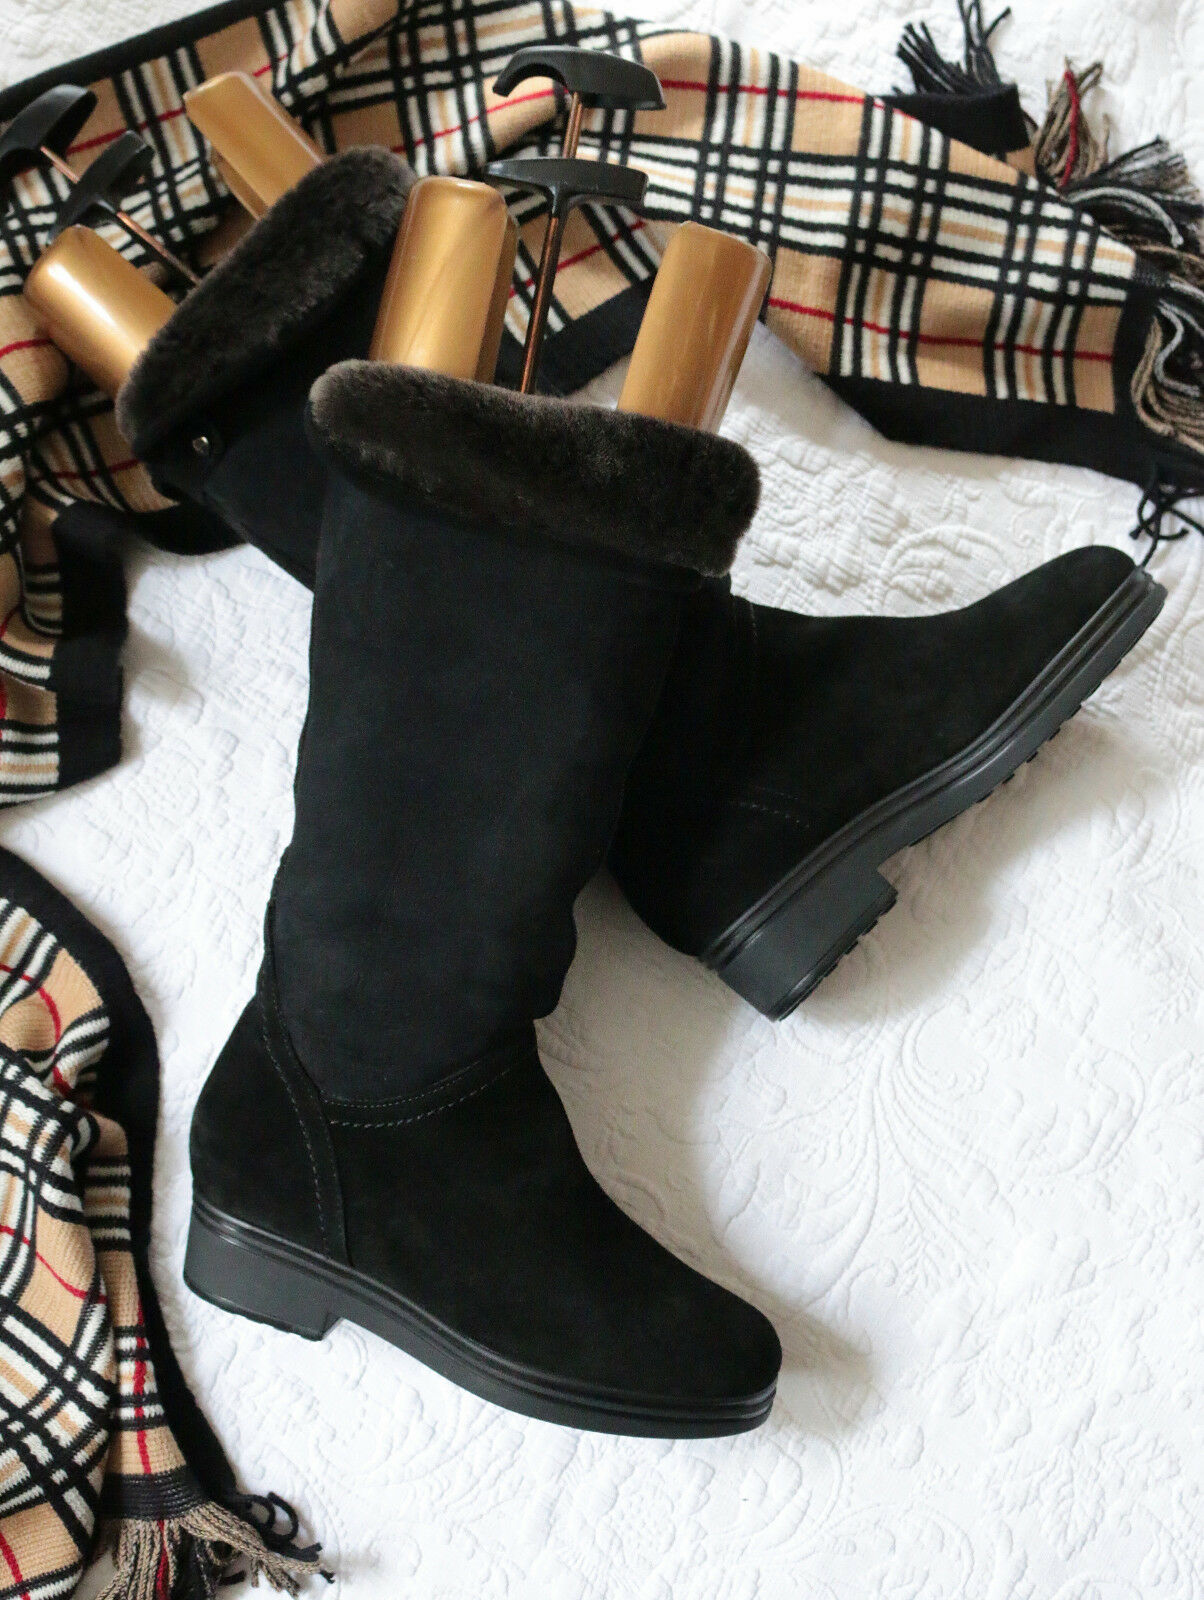 m  italiana de lujo cordero botas Lang caña talla 36 np.450, - como nuevo